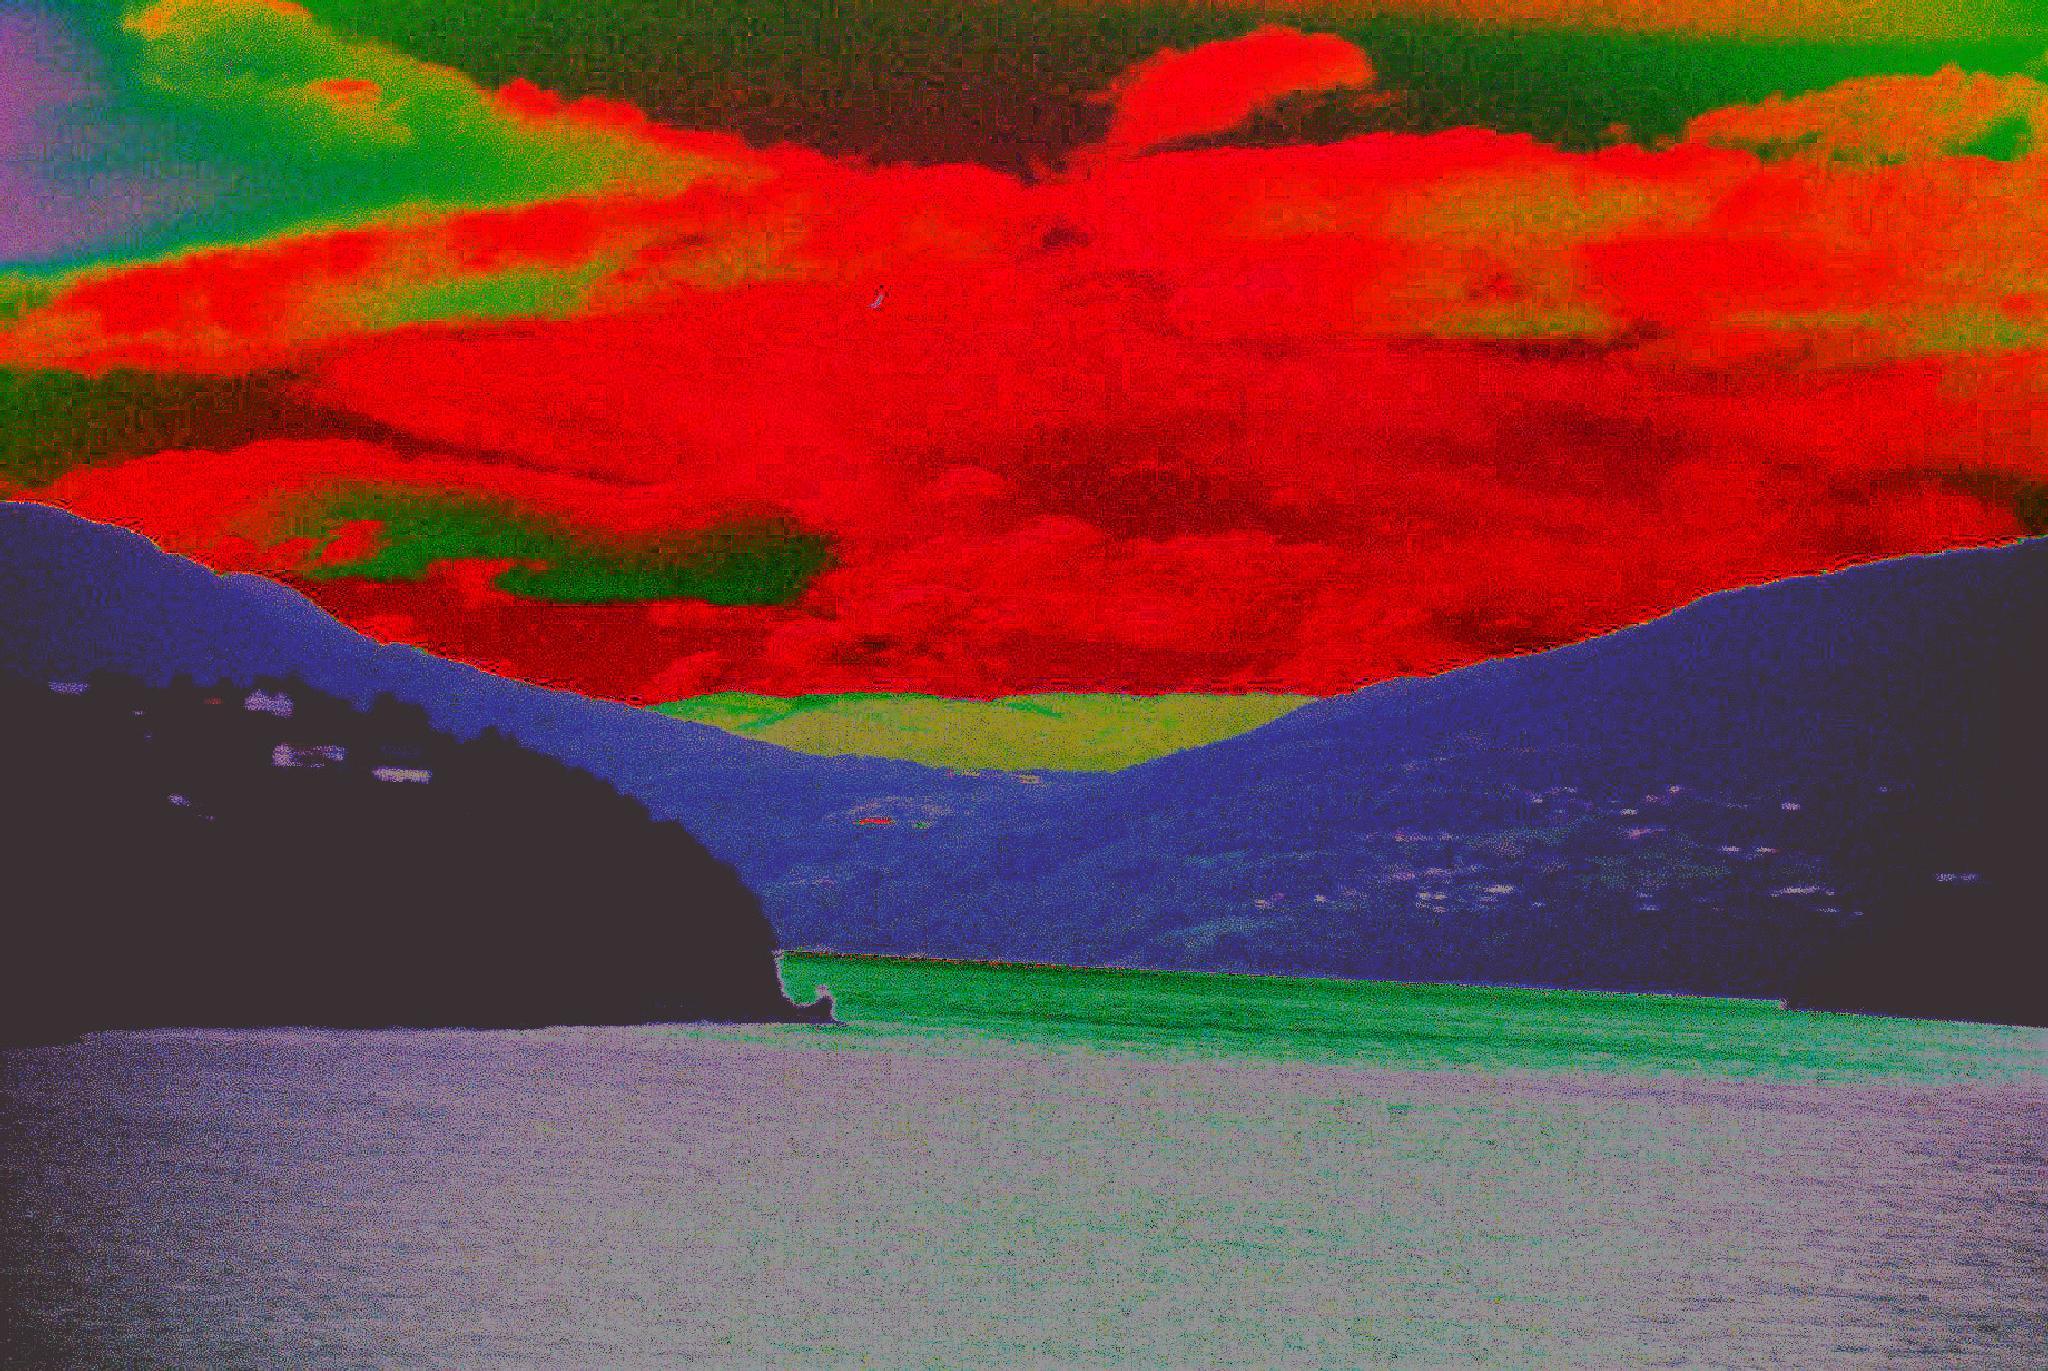 Sky of blood by adrian pendlebury